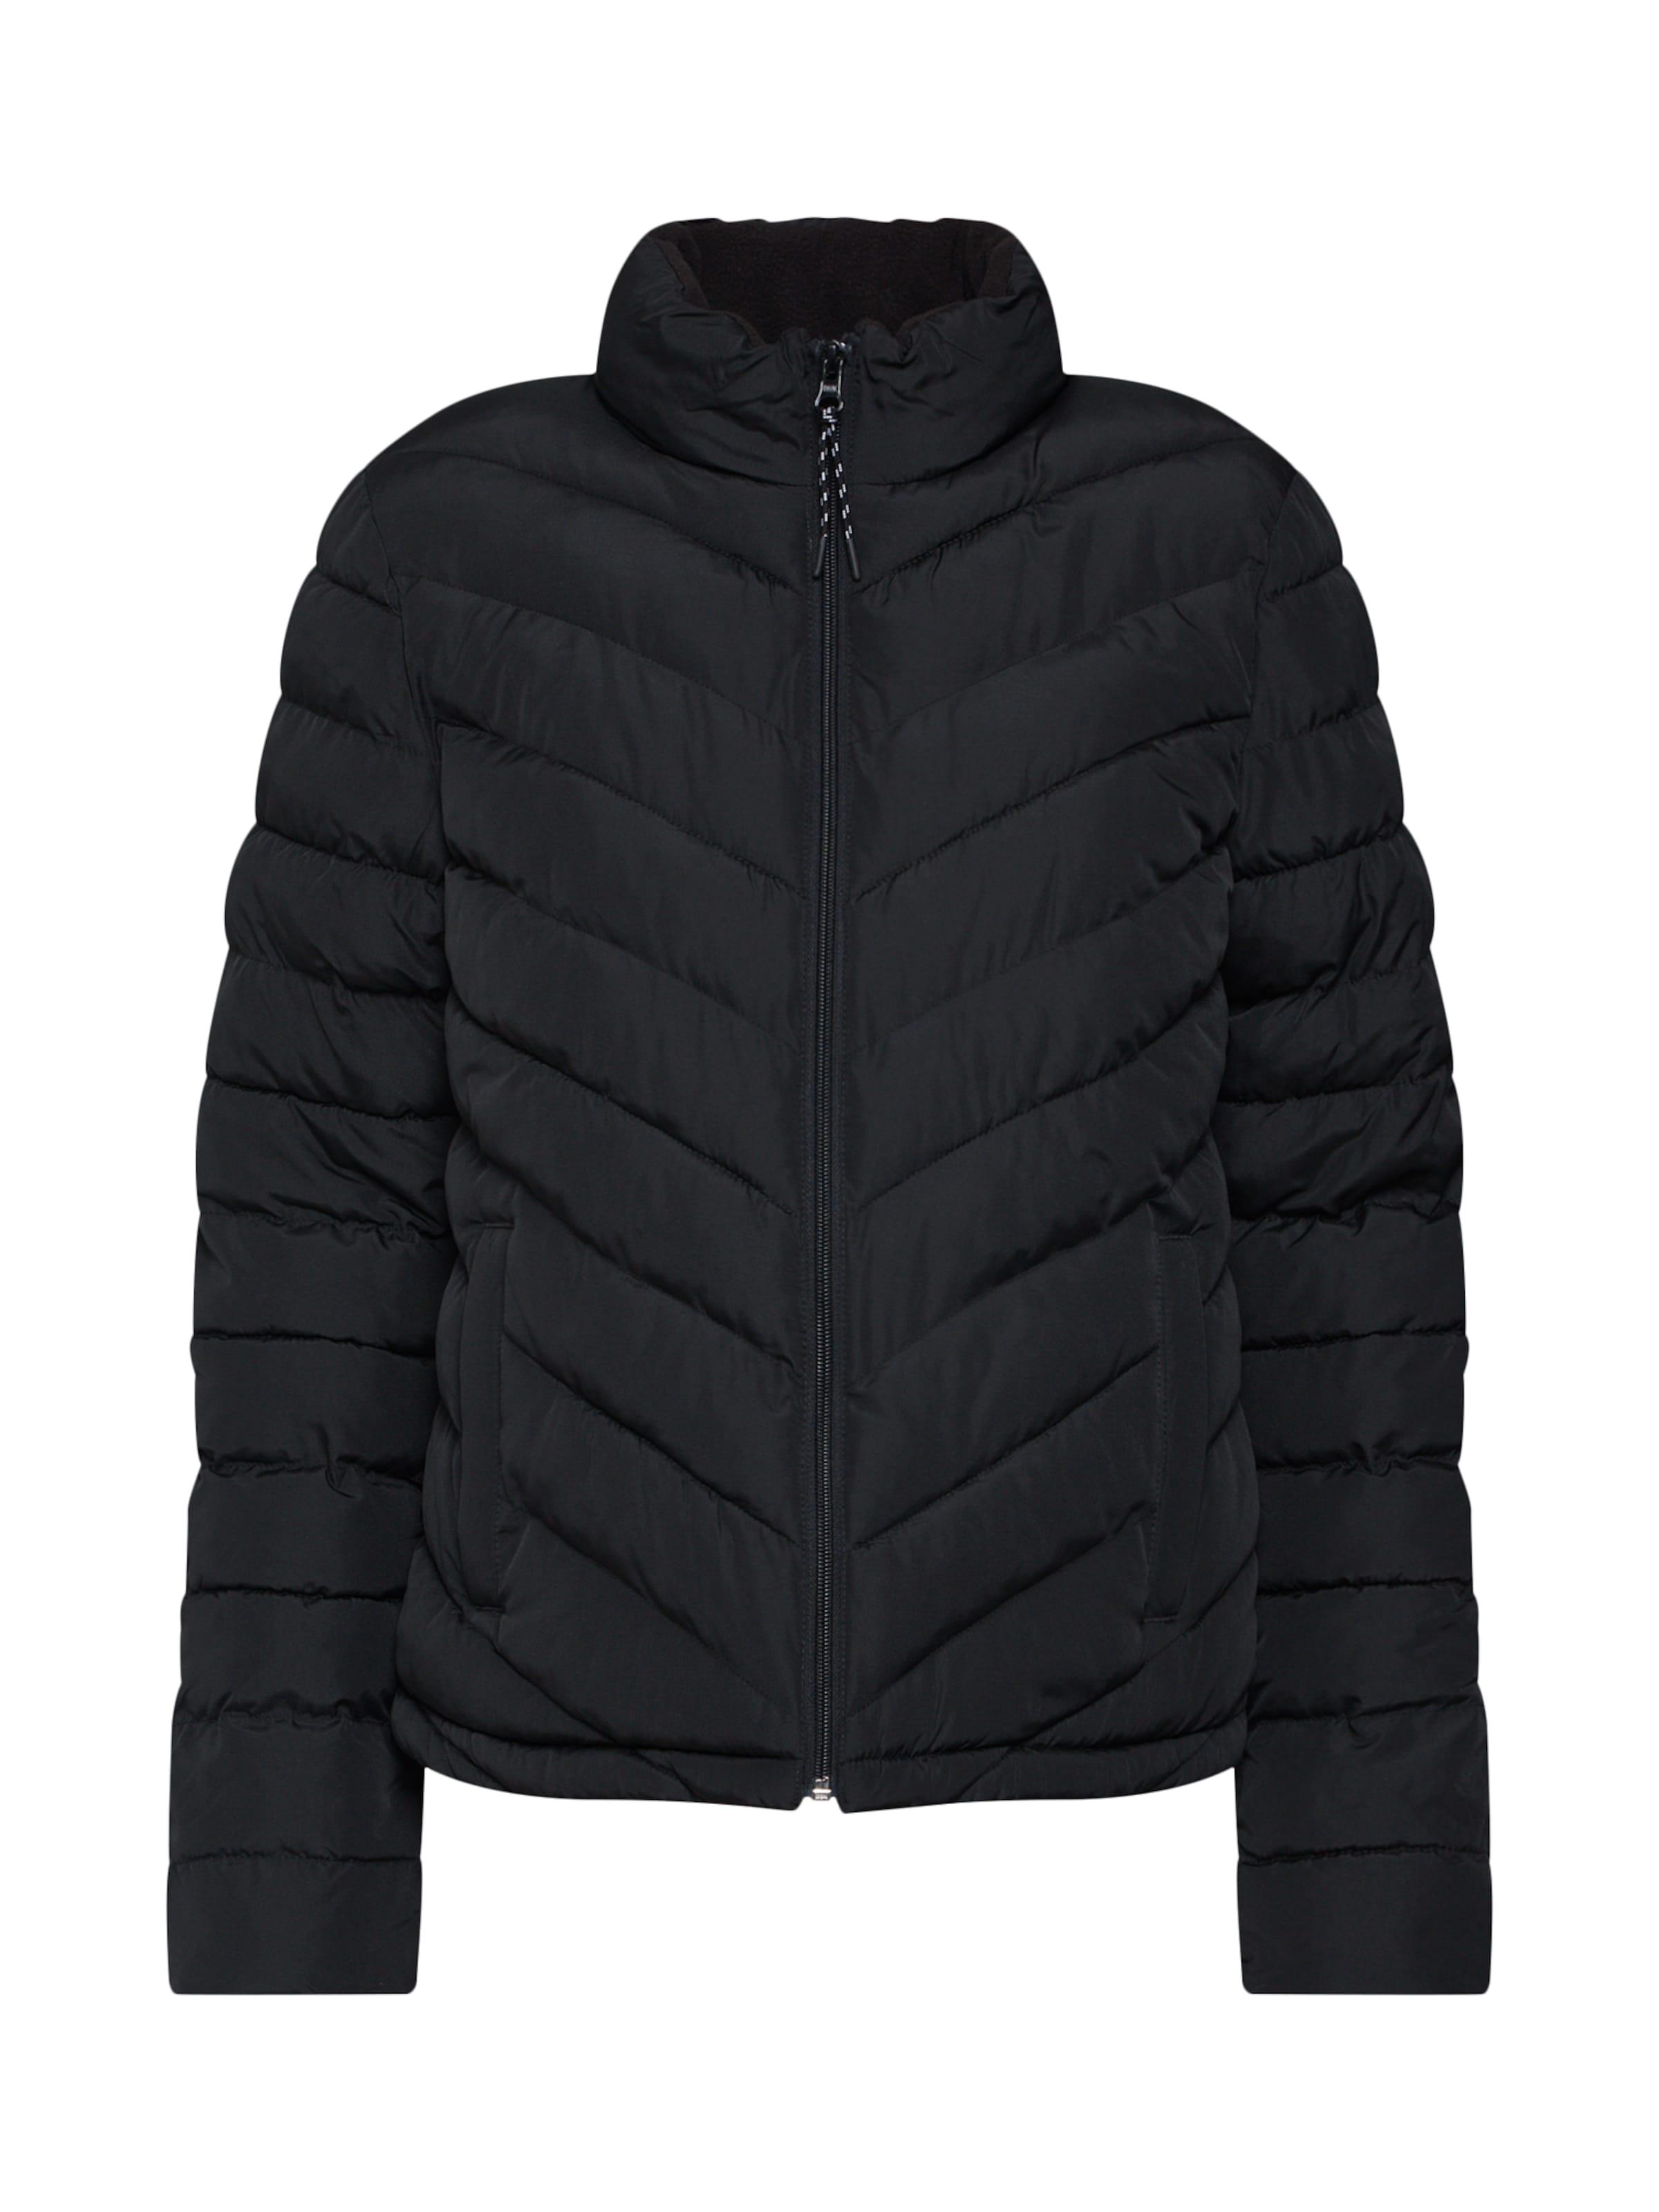 sh Oc 'v In Lw Jacket' D'hiver Vert GapVeste Foncé CxroeBd